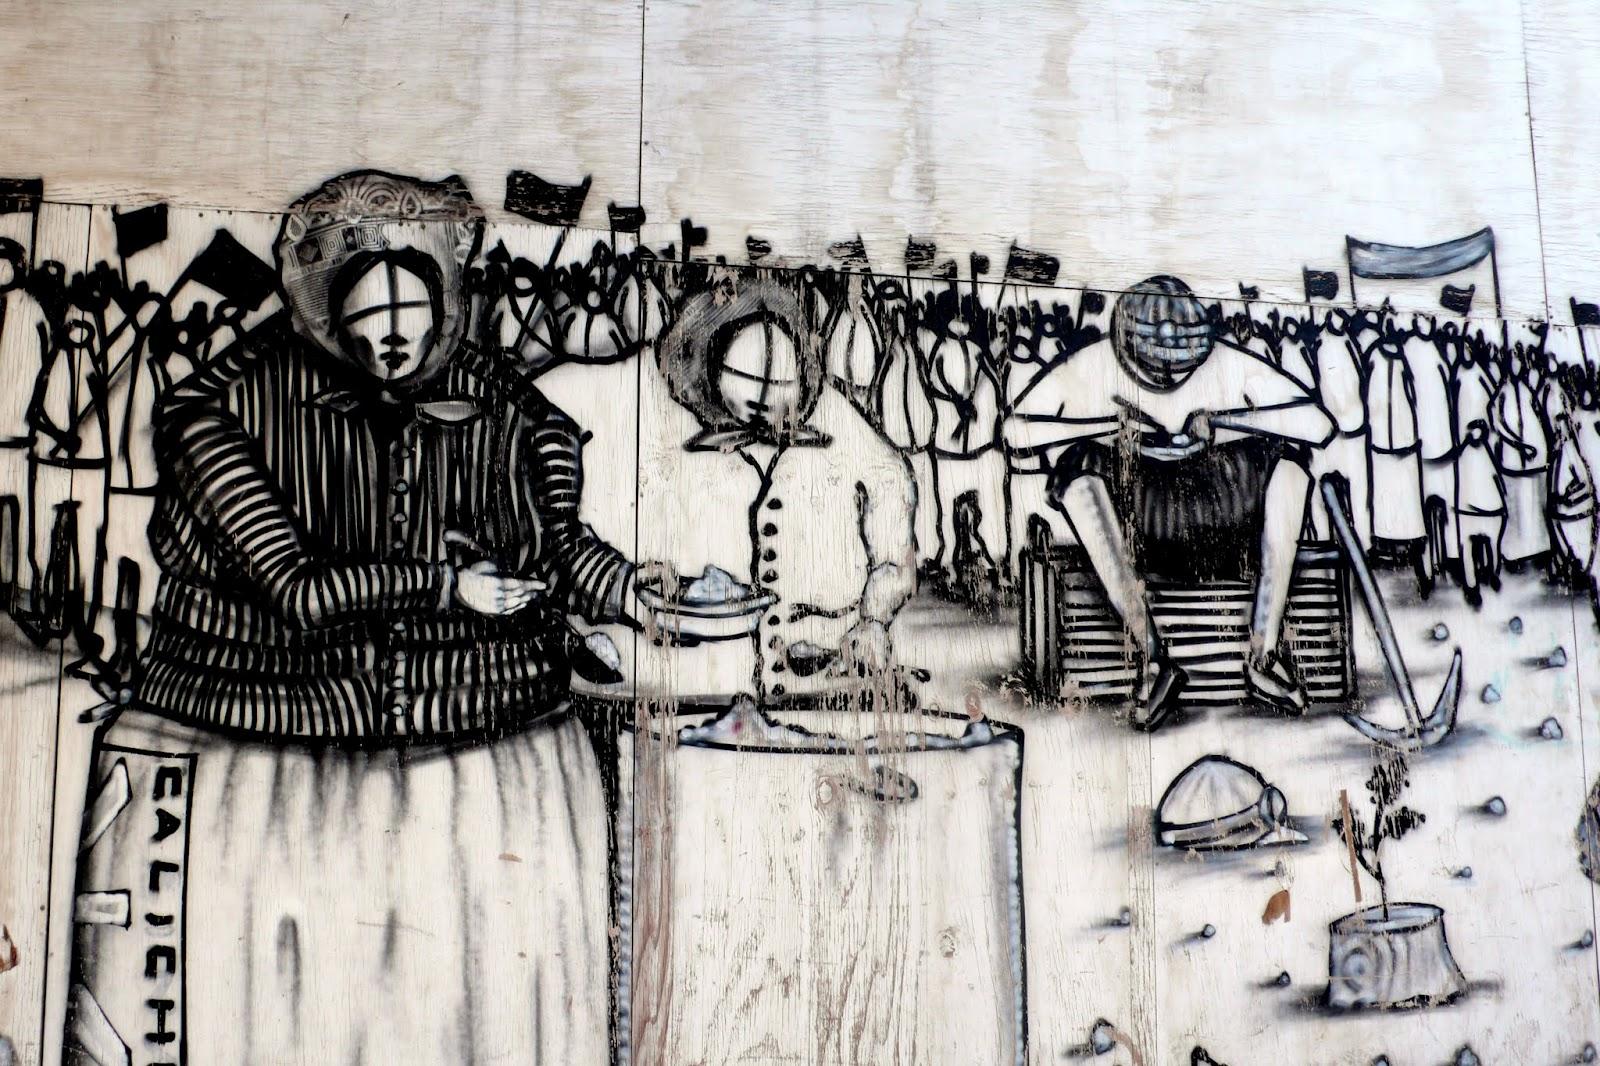 street art in santiago de chile barrio lastarria arte callejero